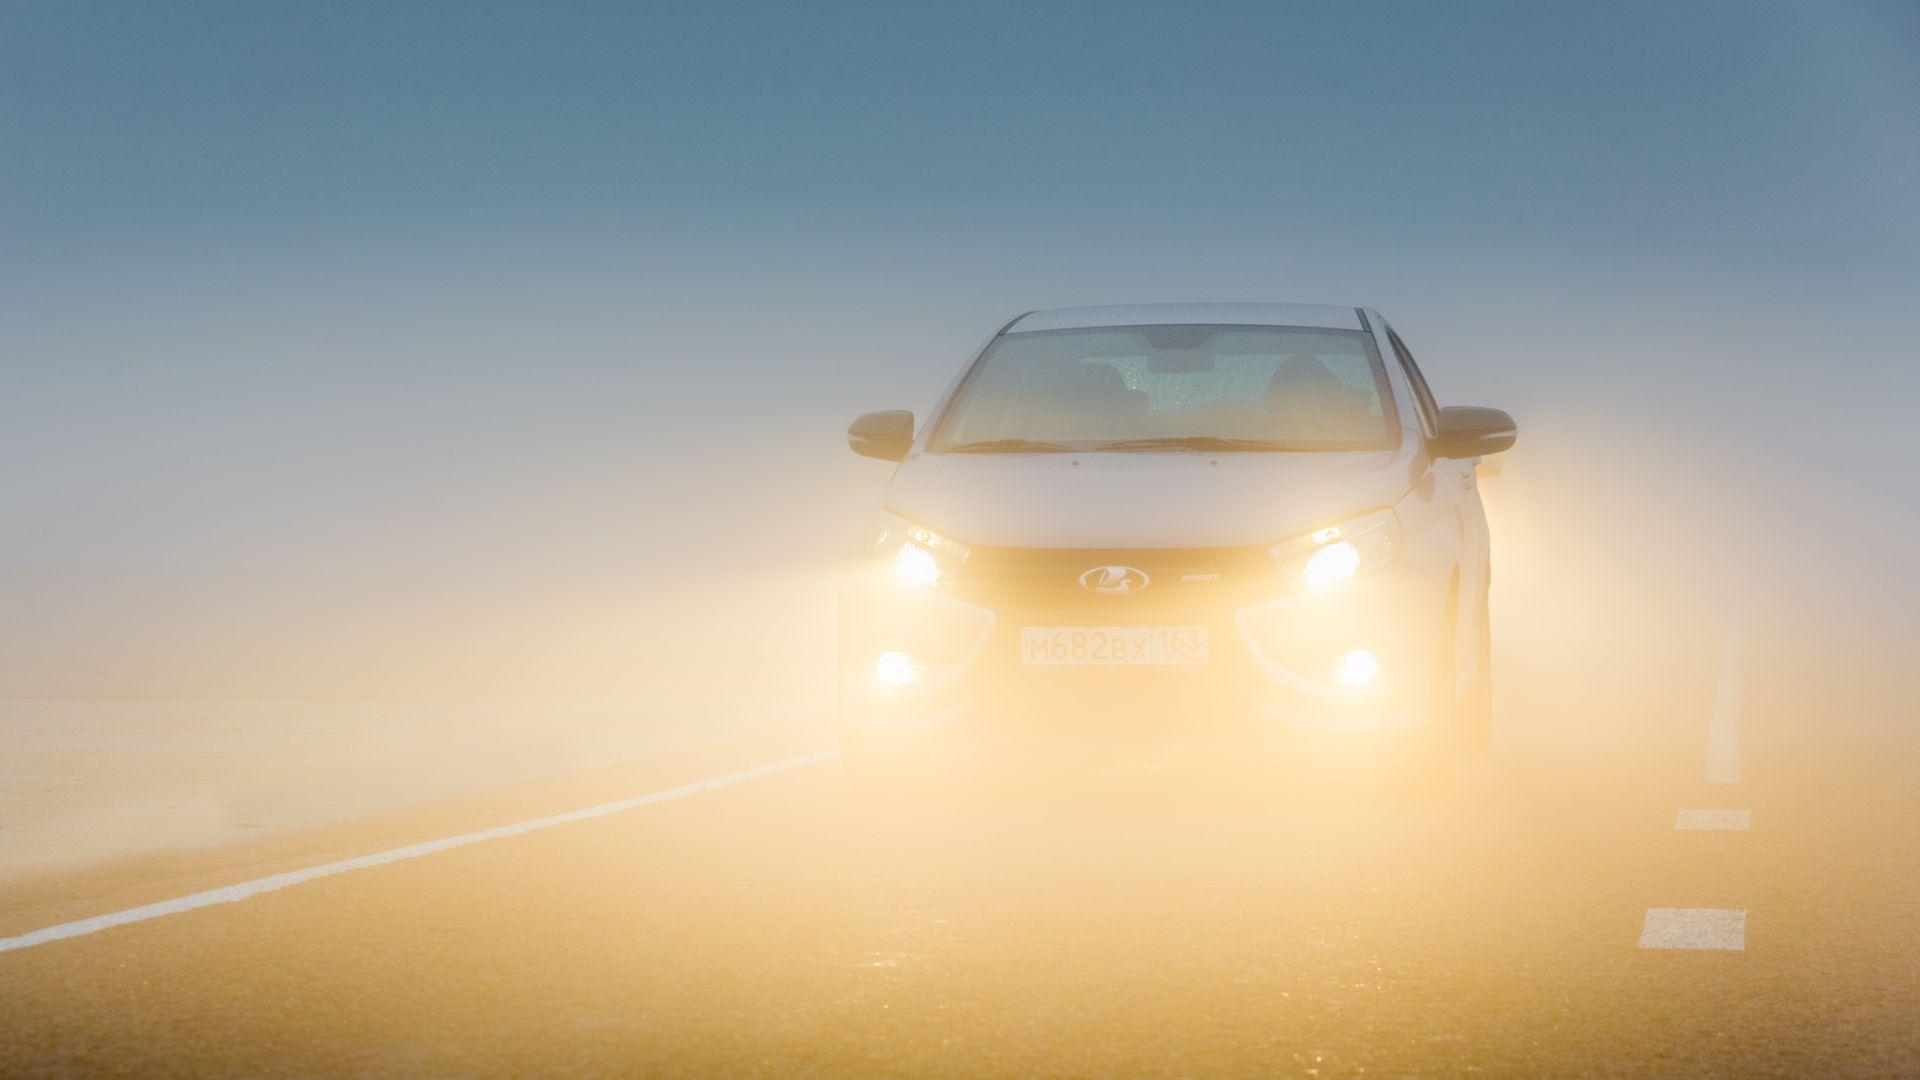 using fog lights when necessary